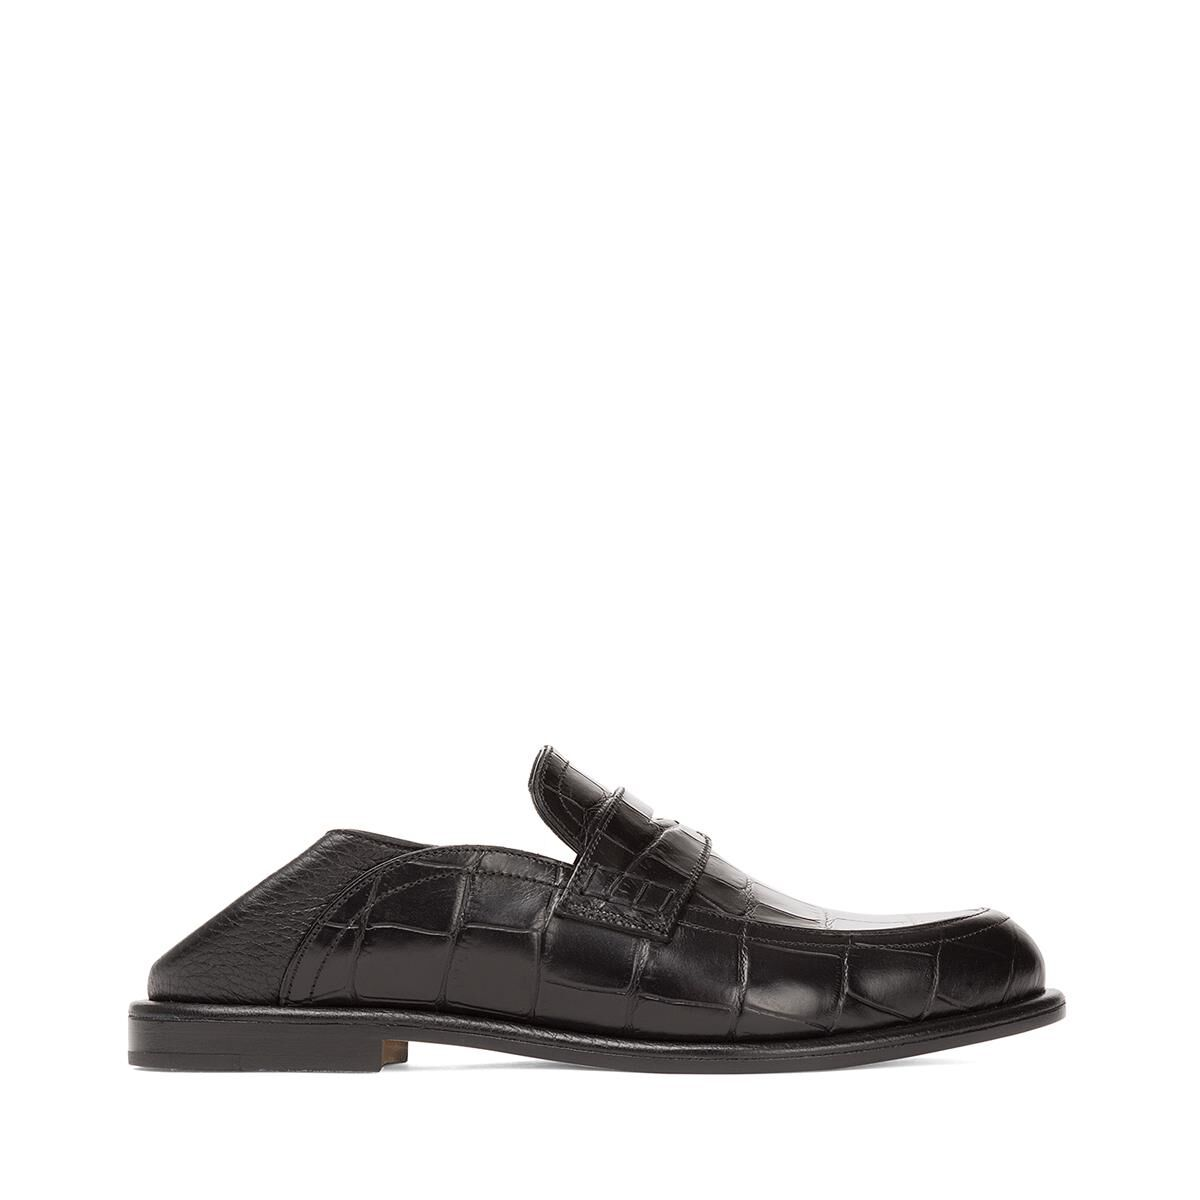 LOEWE Slip On Loafer Black/Black all